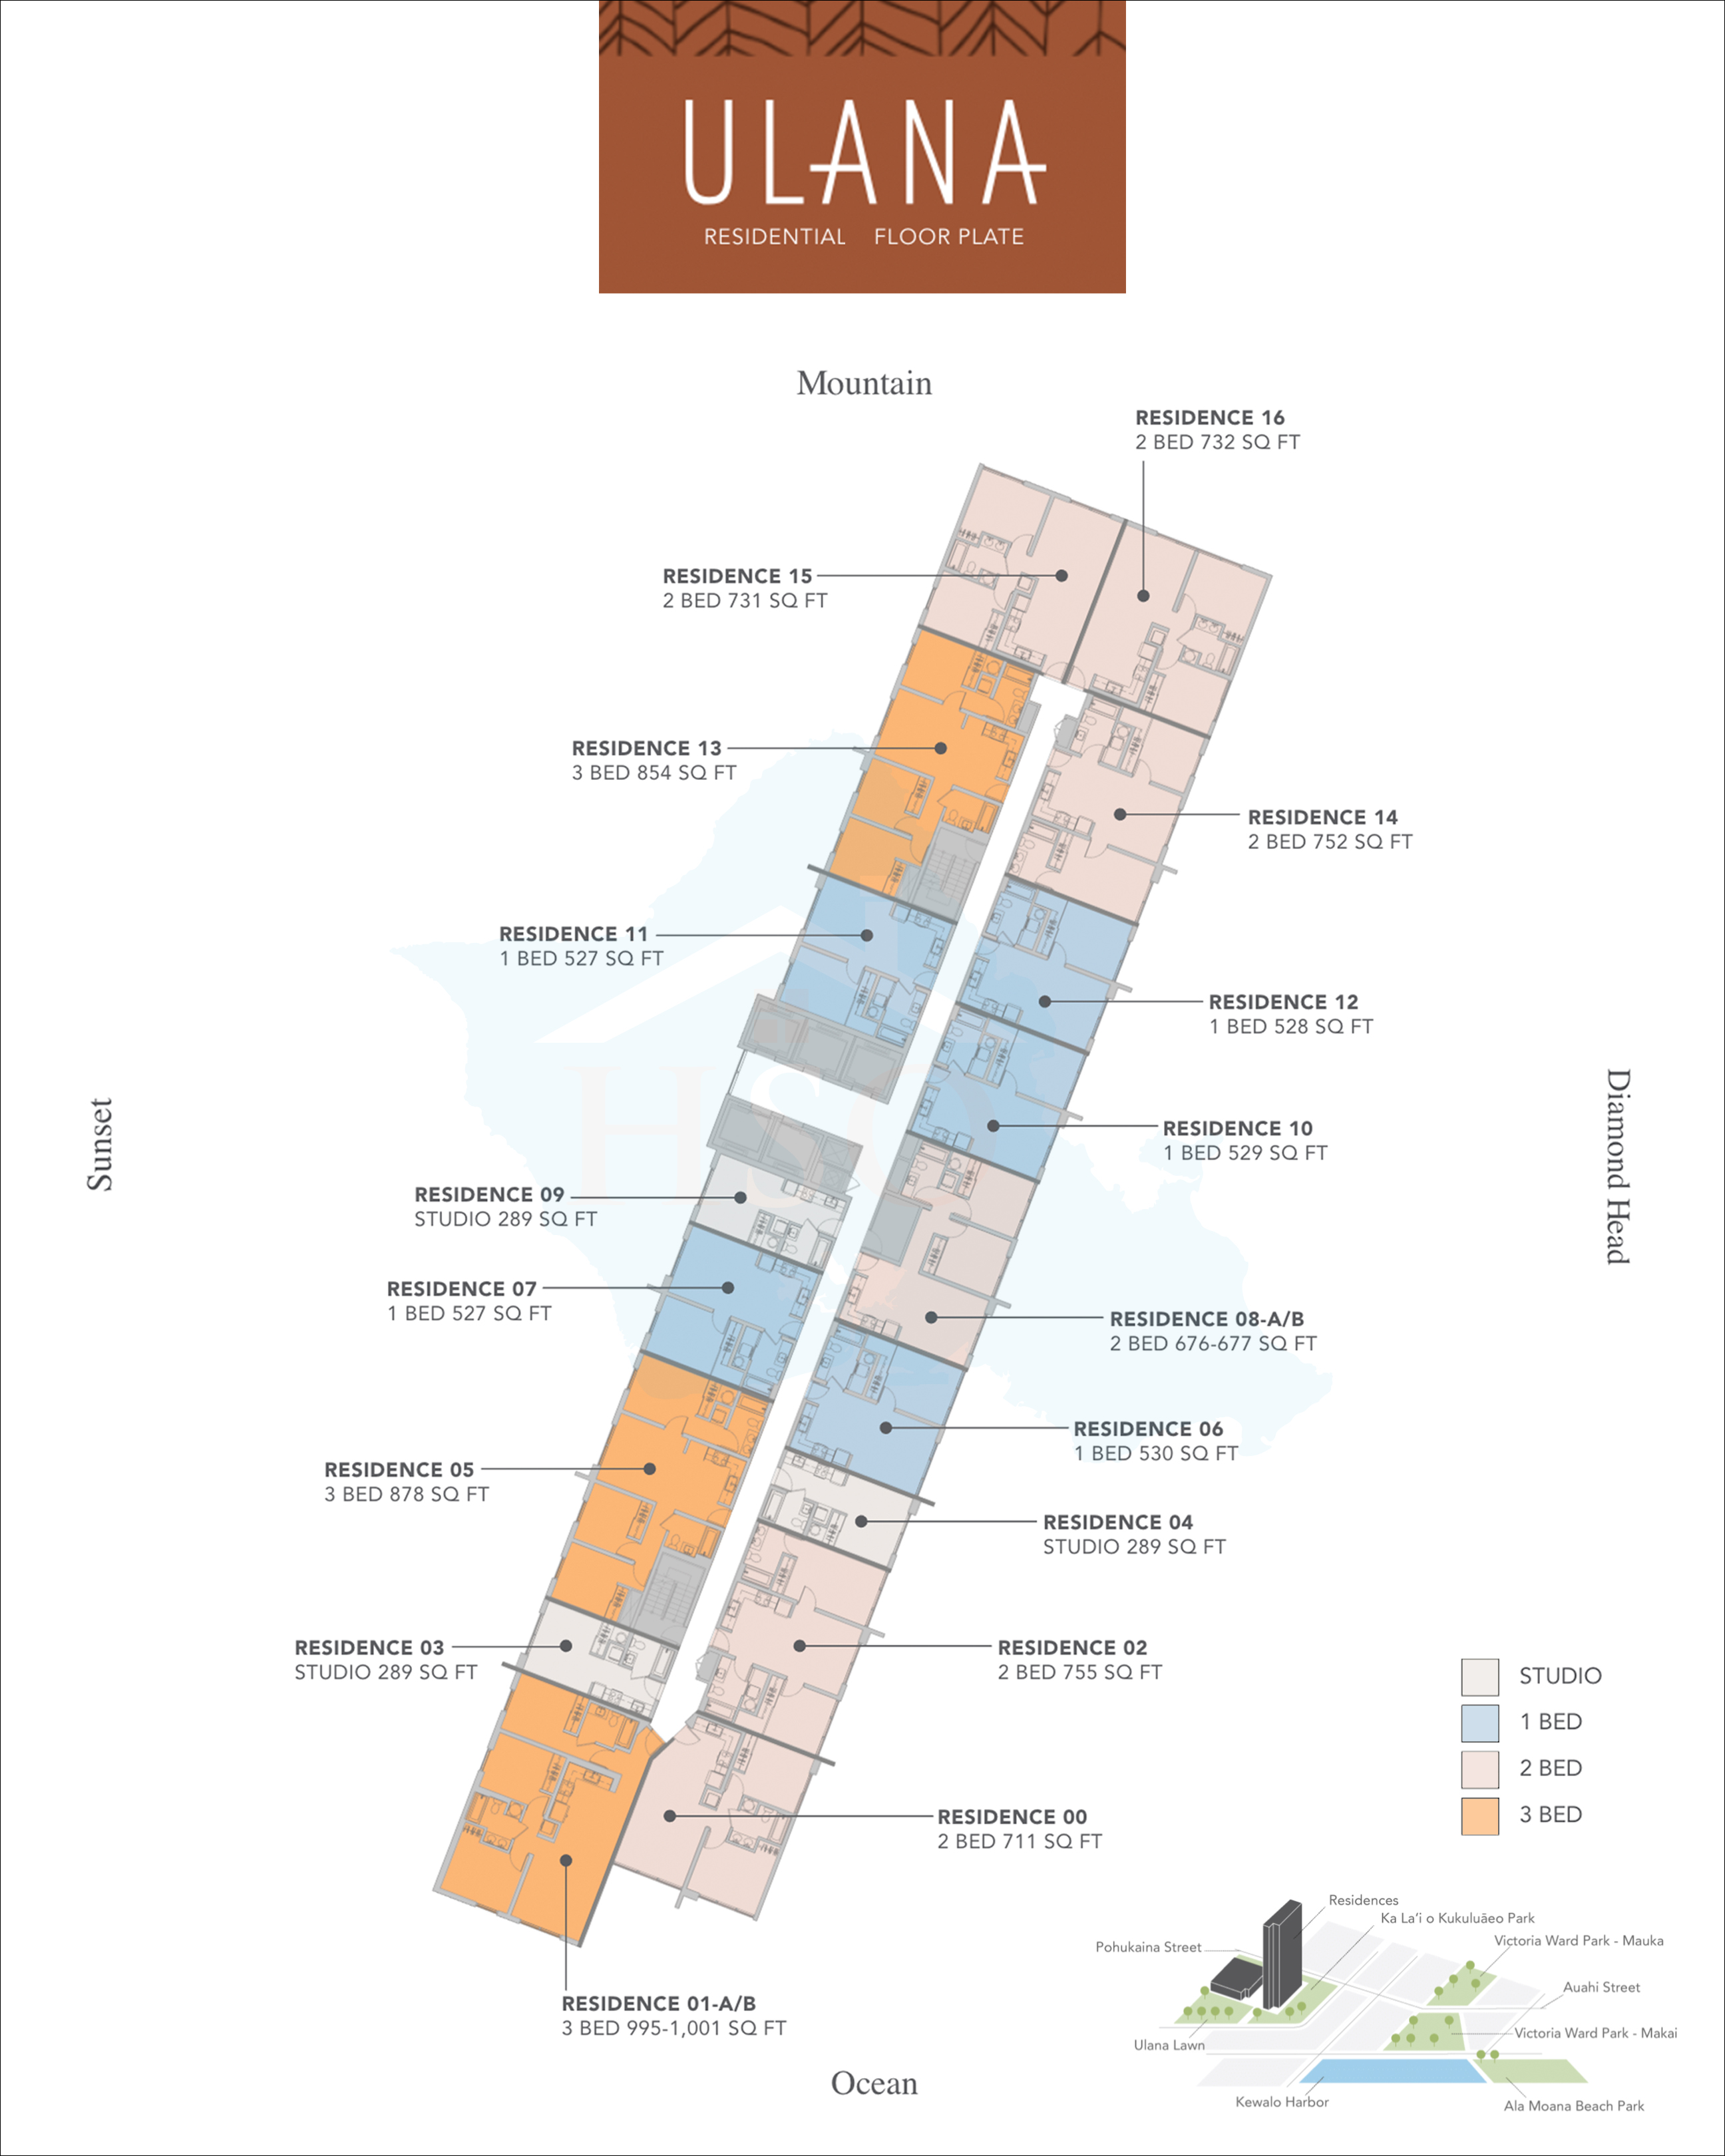 Ulana Ward Village Floor Plan